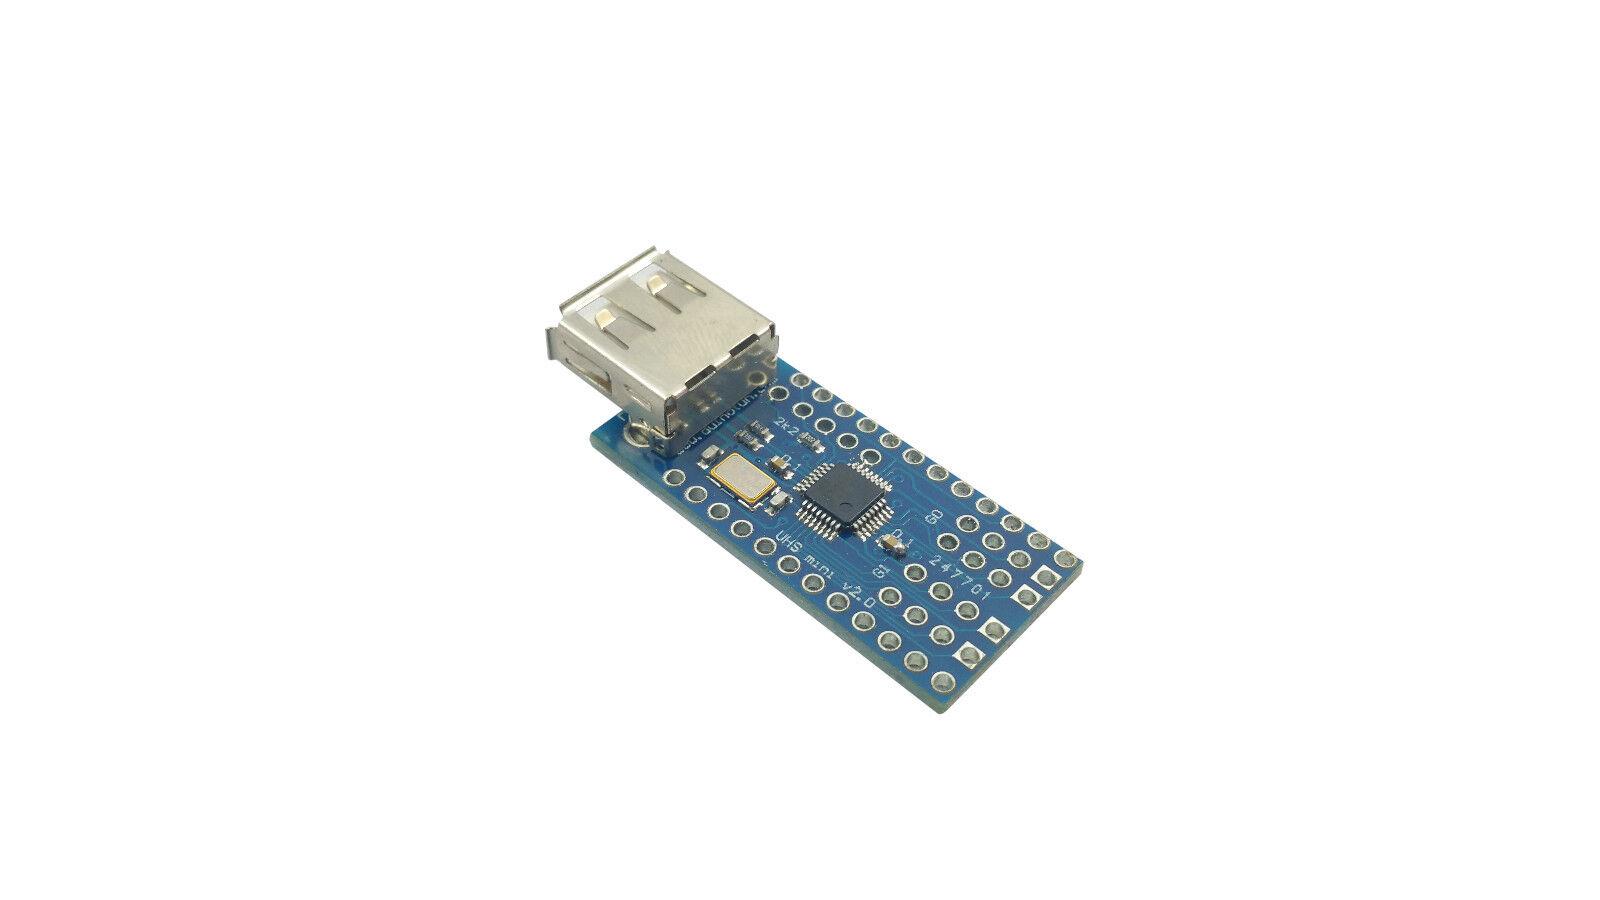 USB_Host_Shield_2 0 - Bountysource